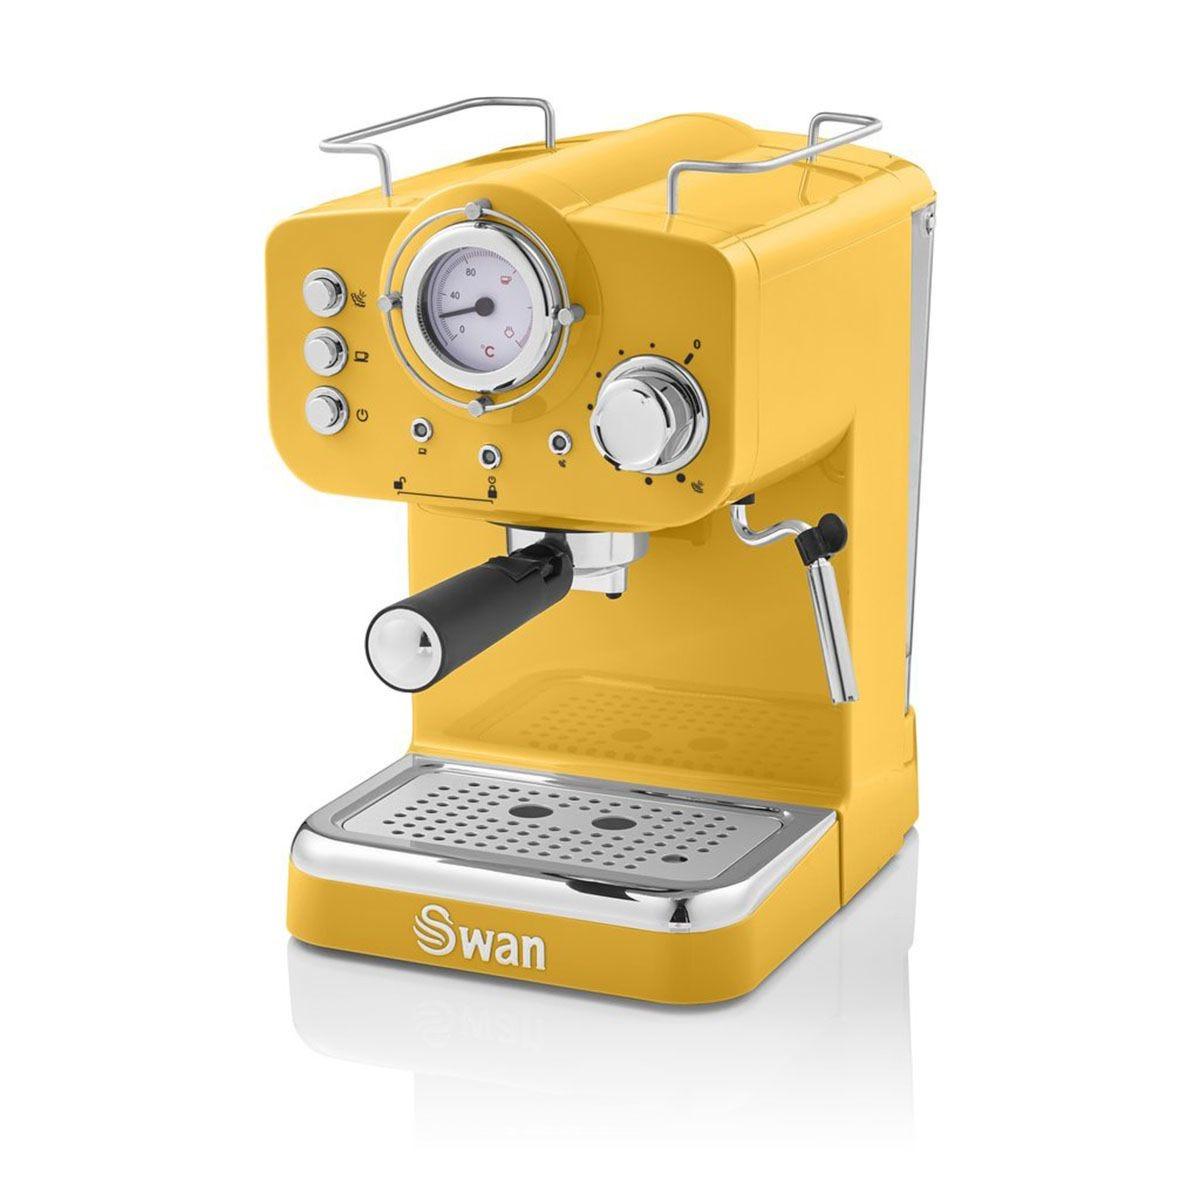 Swan SK22110YELN Pump Espresso Coffee Machine - Yellow